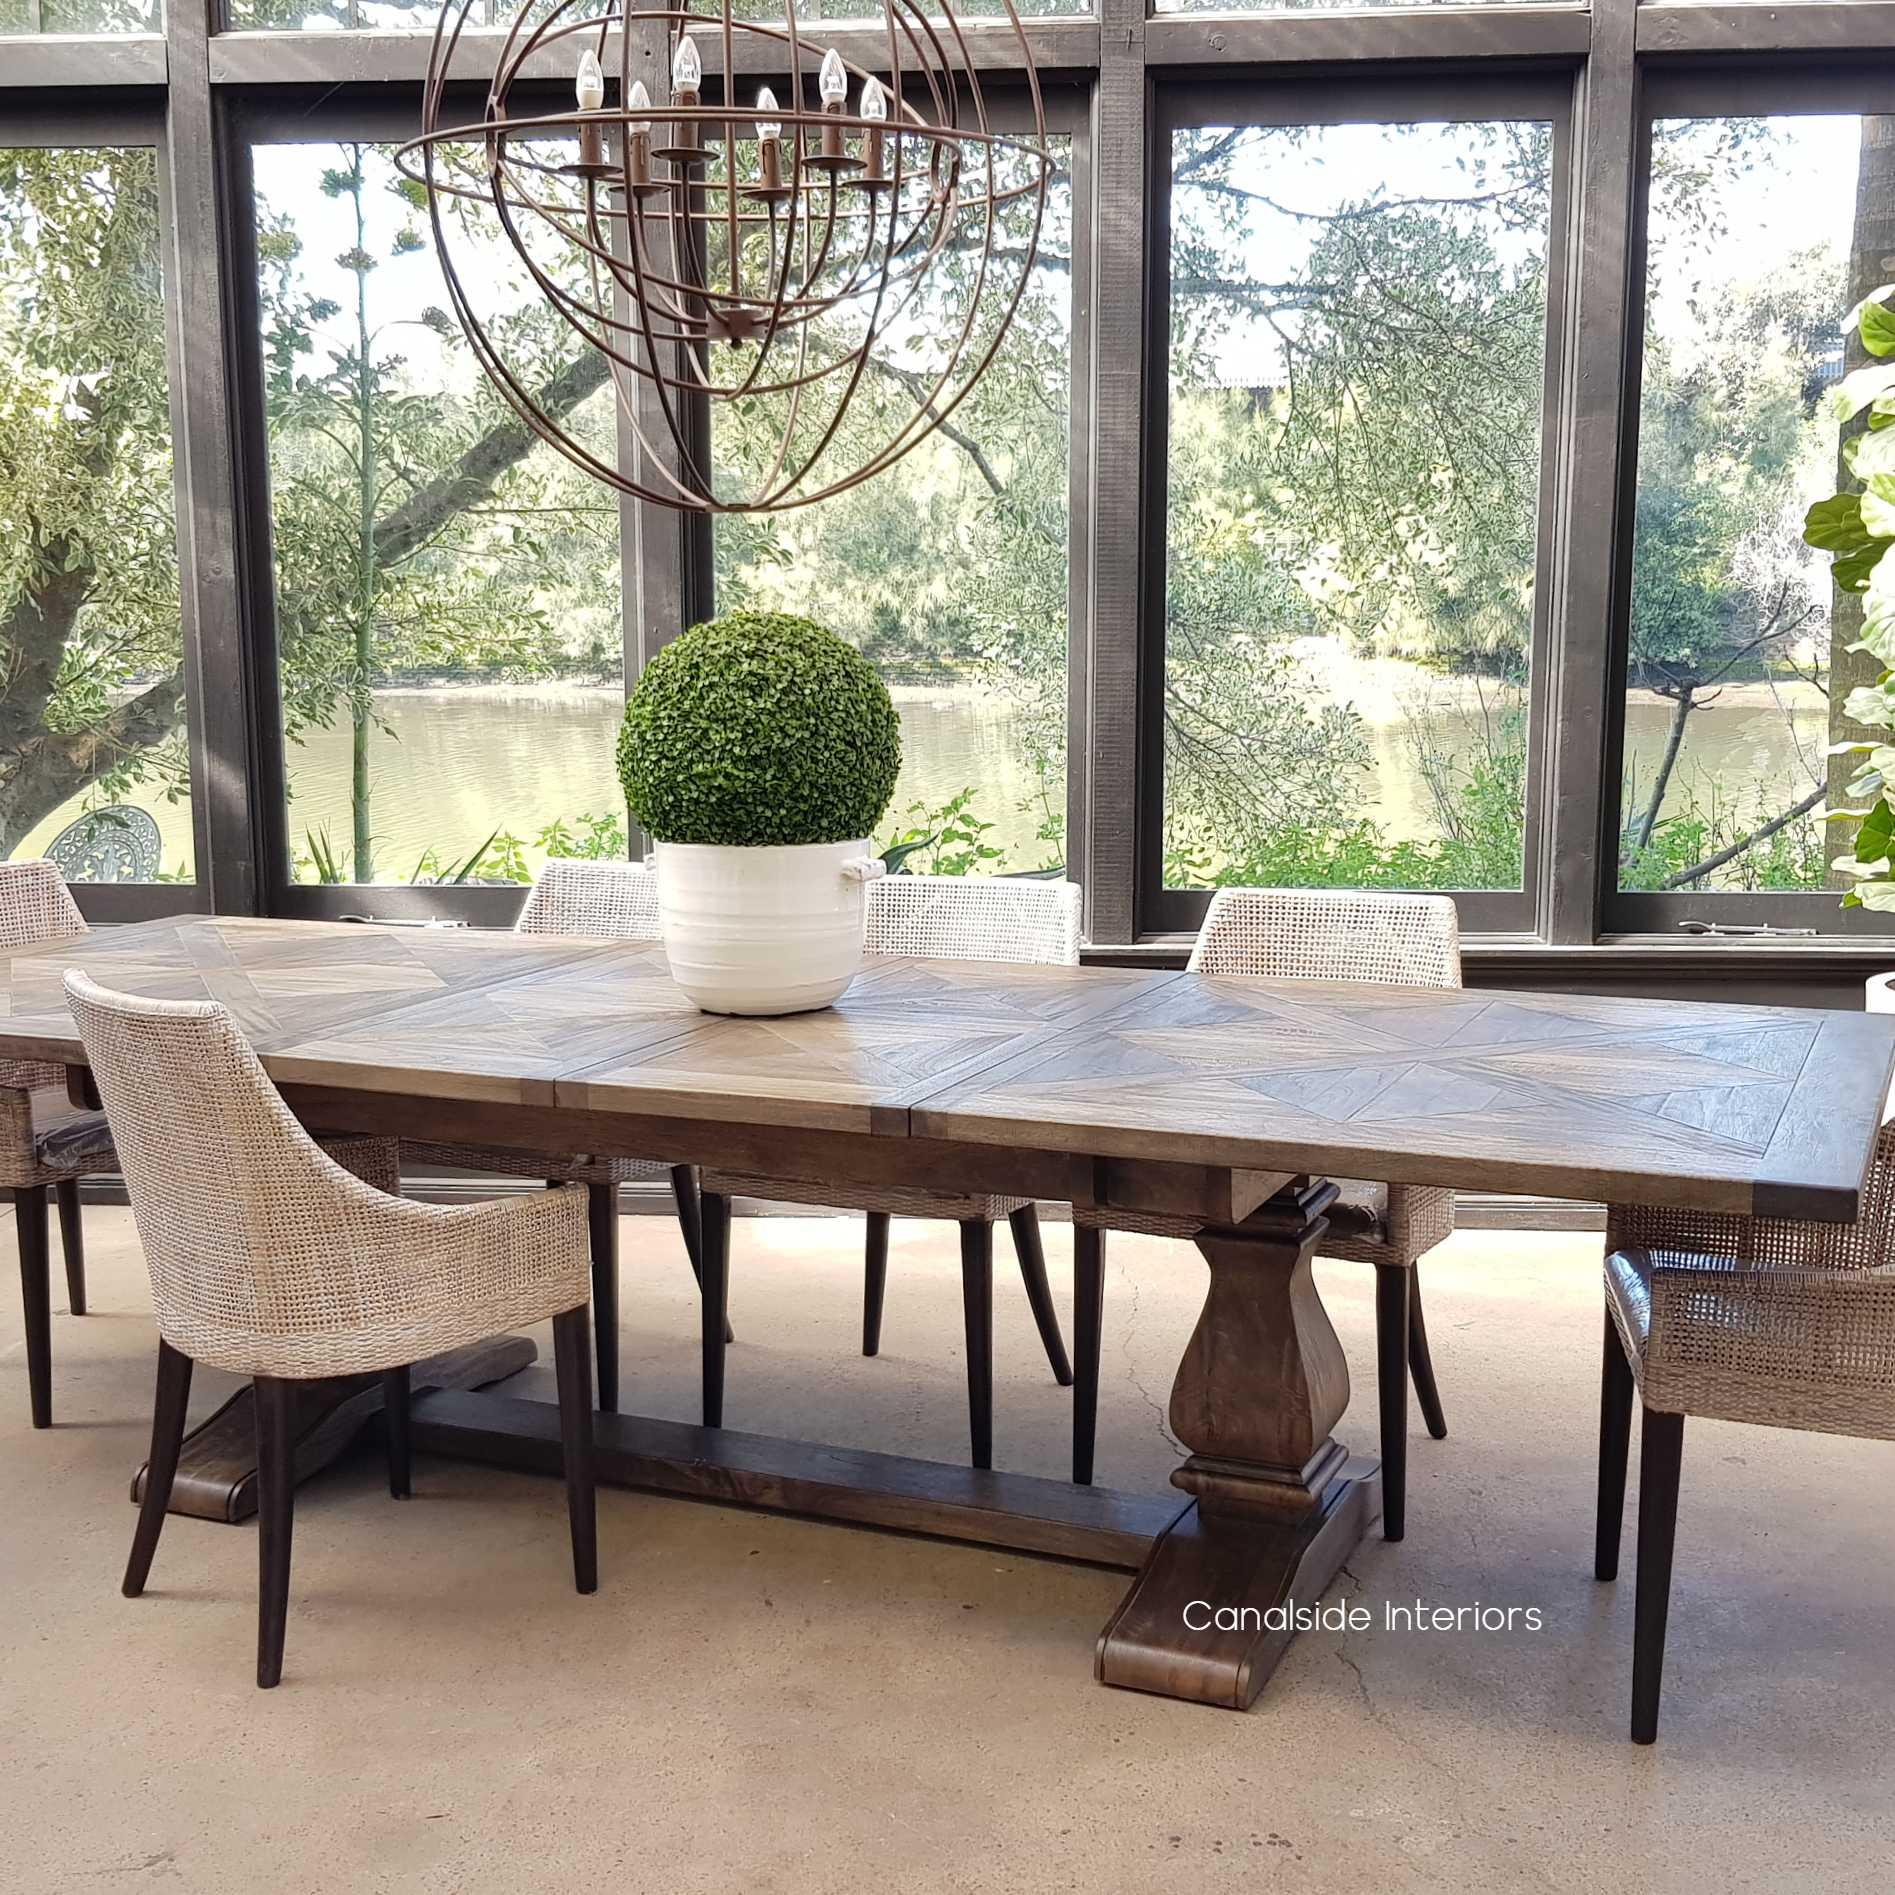 Bridgehampton Parquetry Double Extension Dining Table tables, hamptons, hamptons, hampton table, provincial, plantation, dining tables, trestle base, dining room